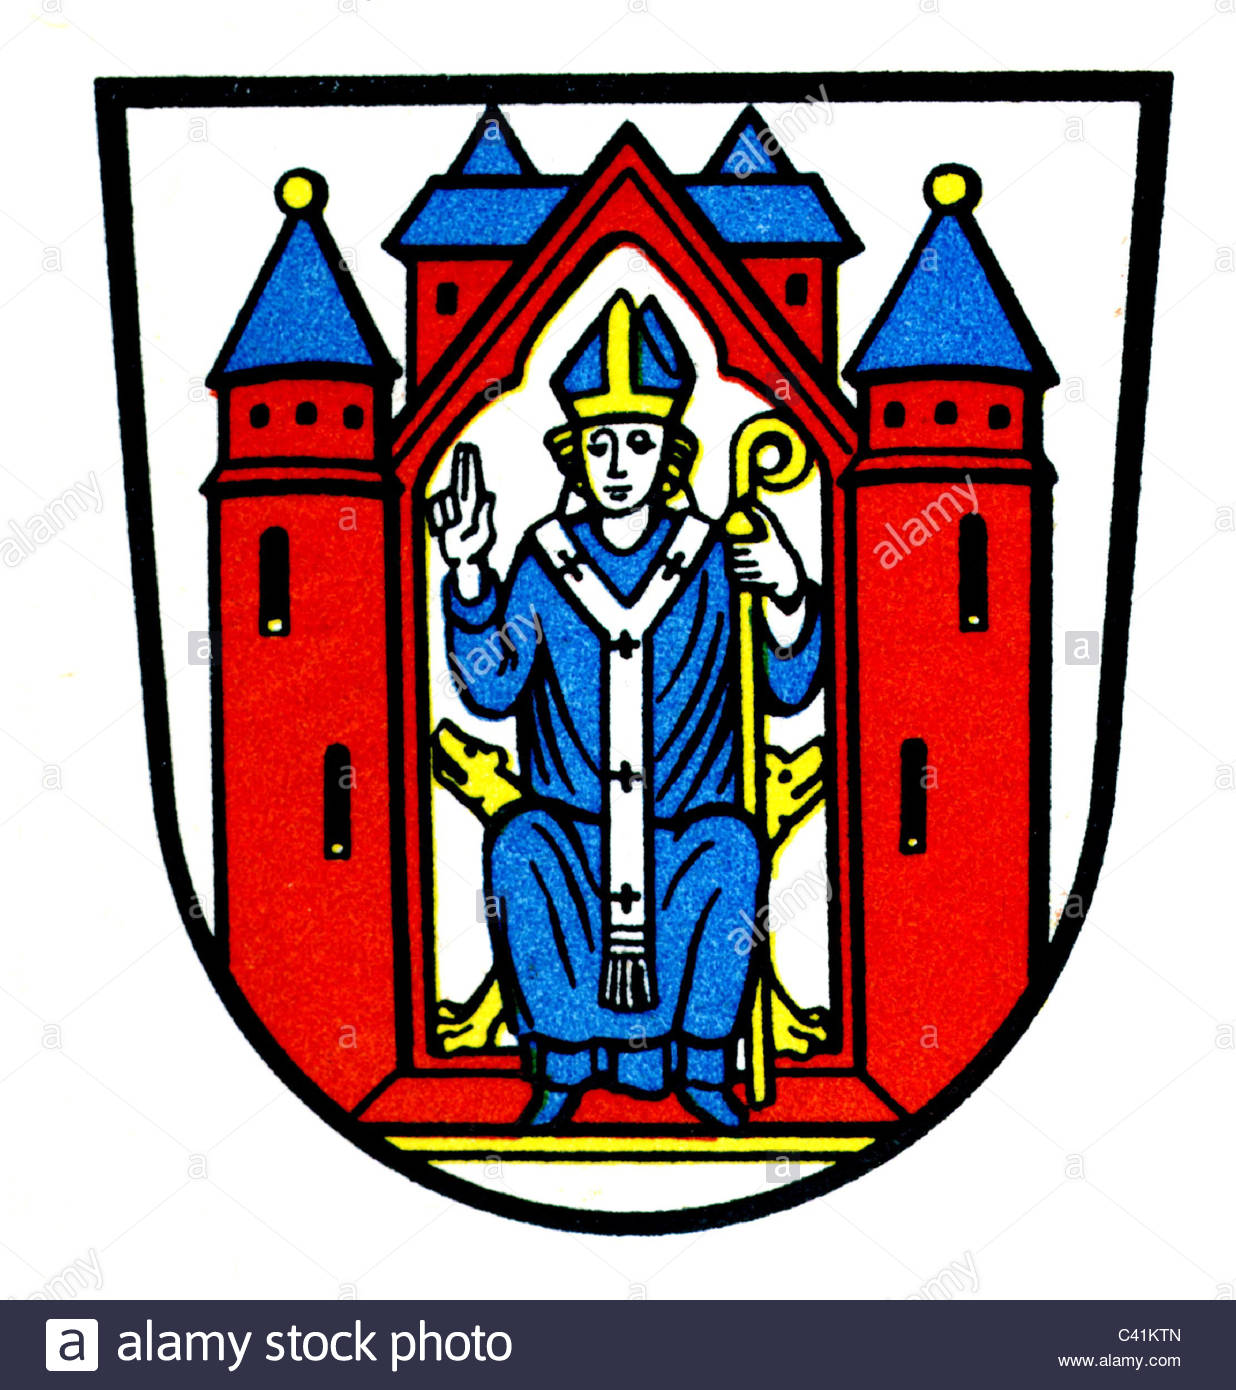 Coat Of Arms / Emblems, Aschaffenburg, City Arms, Bavaria, Germany.